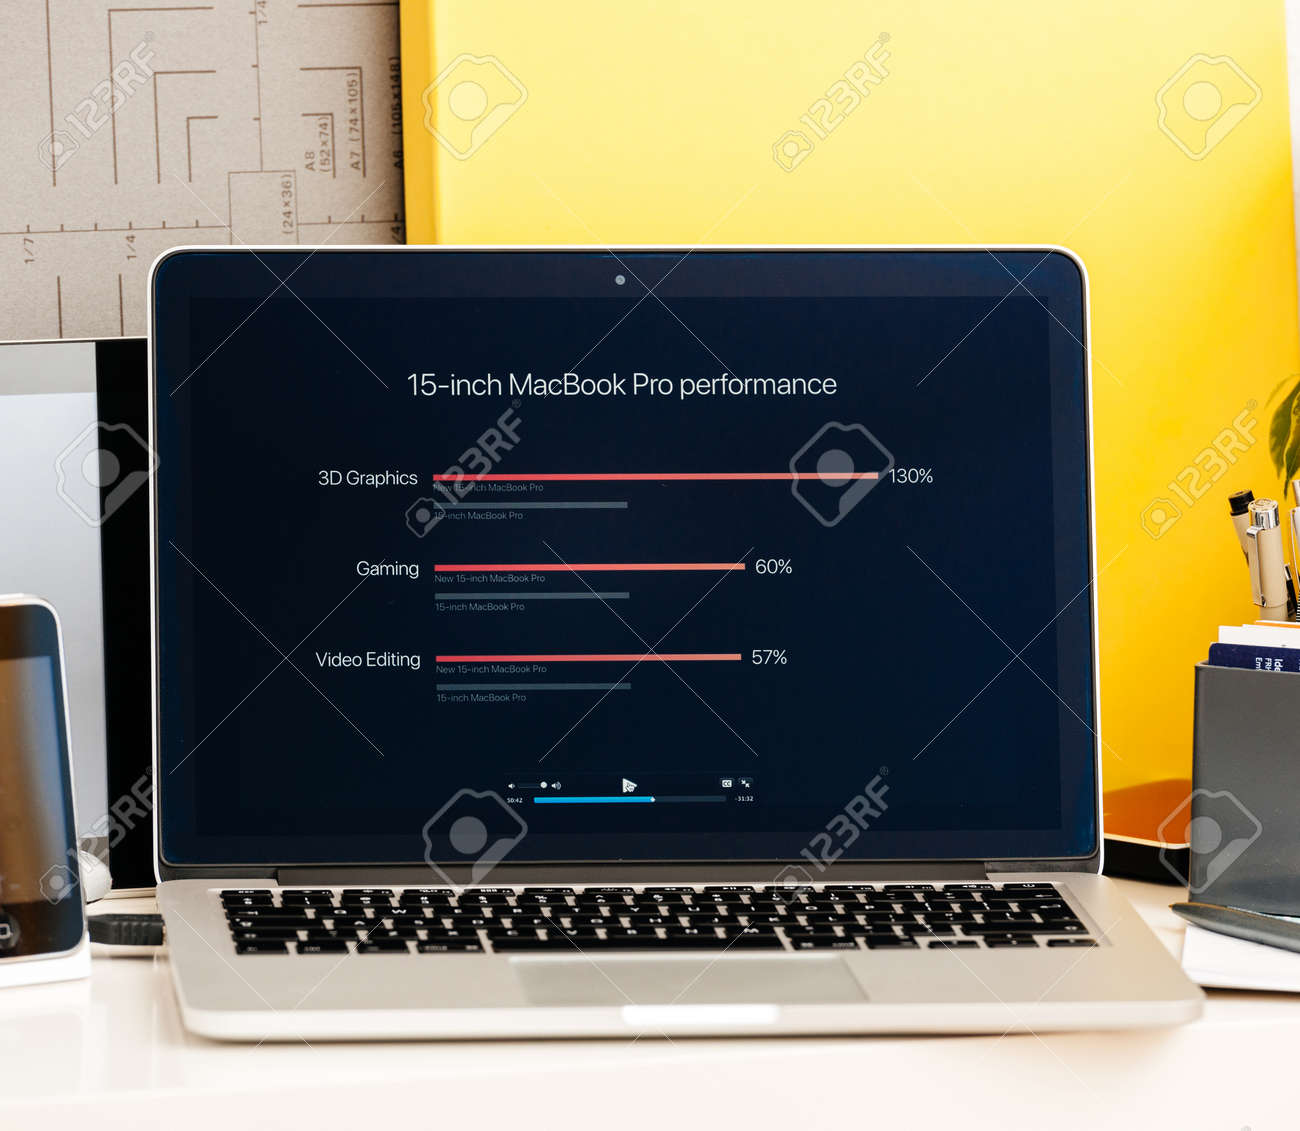 PARIS, FRANCE - OCT 28 2016: Apple Computers website on new MacBook